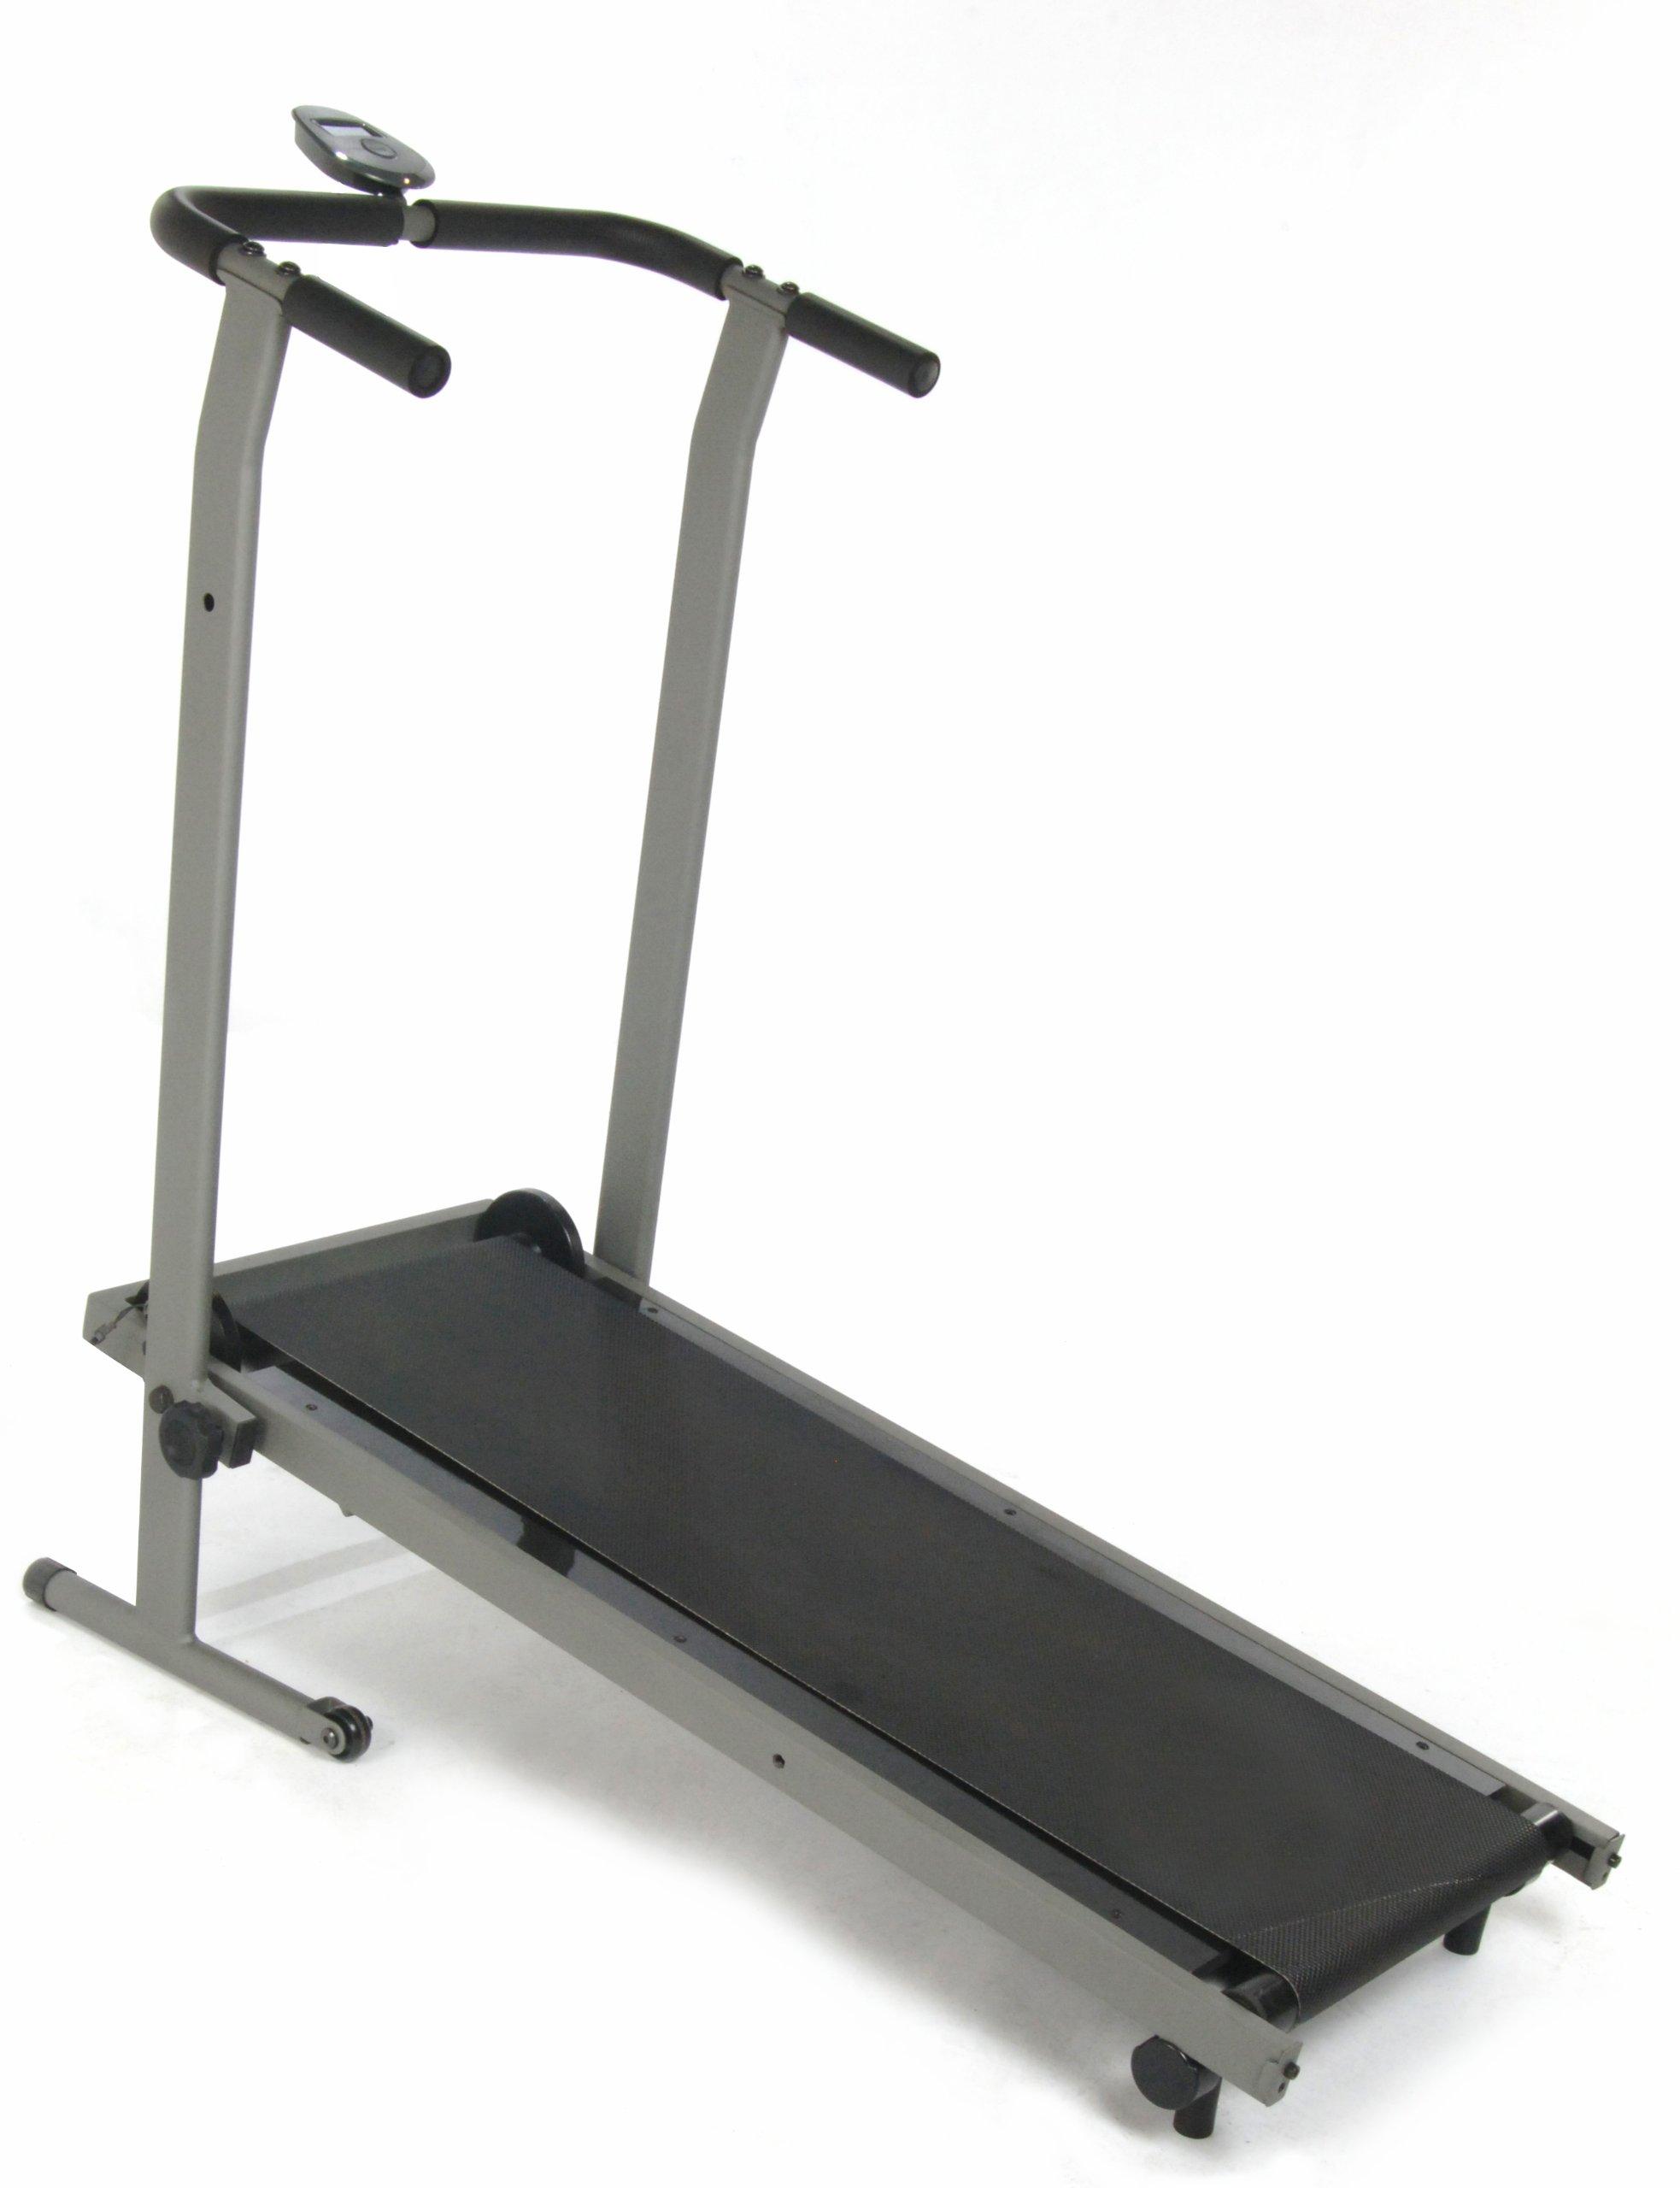 Stamina Inmotion Manual Treadmill (Pewter Grey, Black) by Stamina